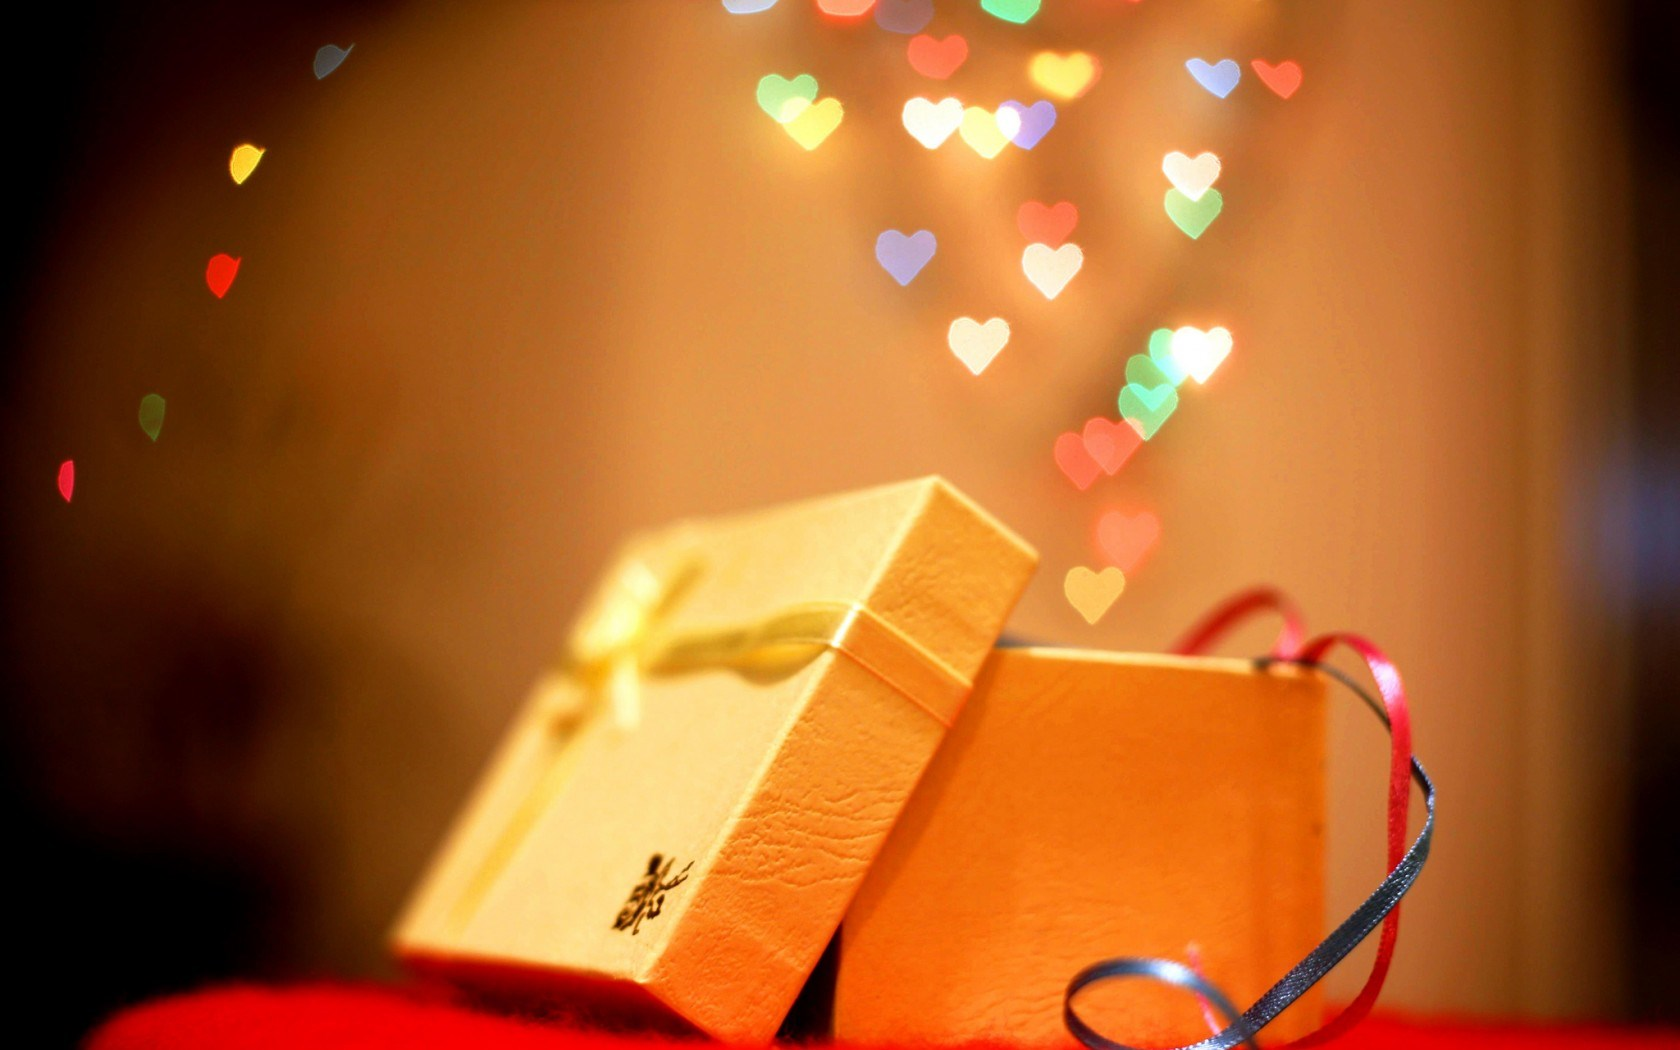 holiday gift box wallpapers 40023